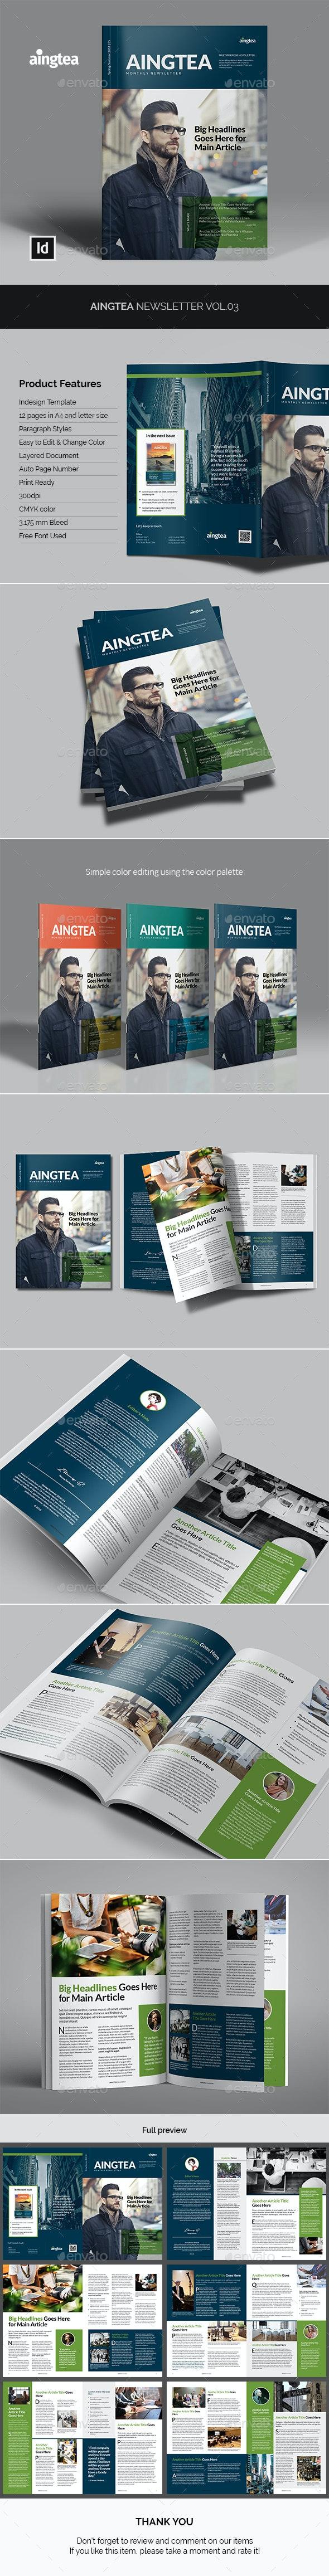 Aingtea Newsletter Vol.03 - Newsletters Print Templates